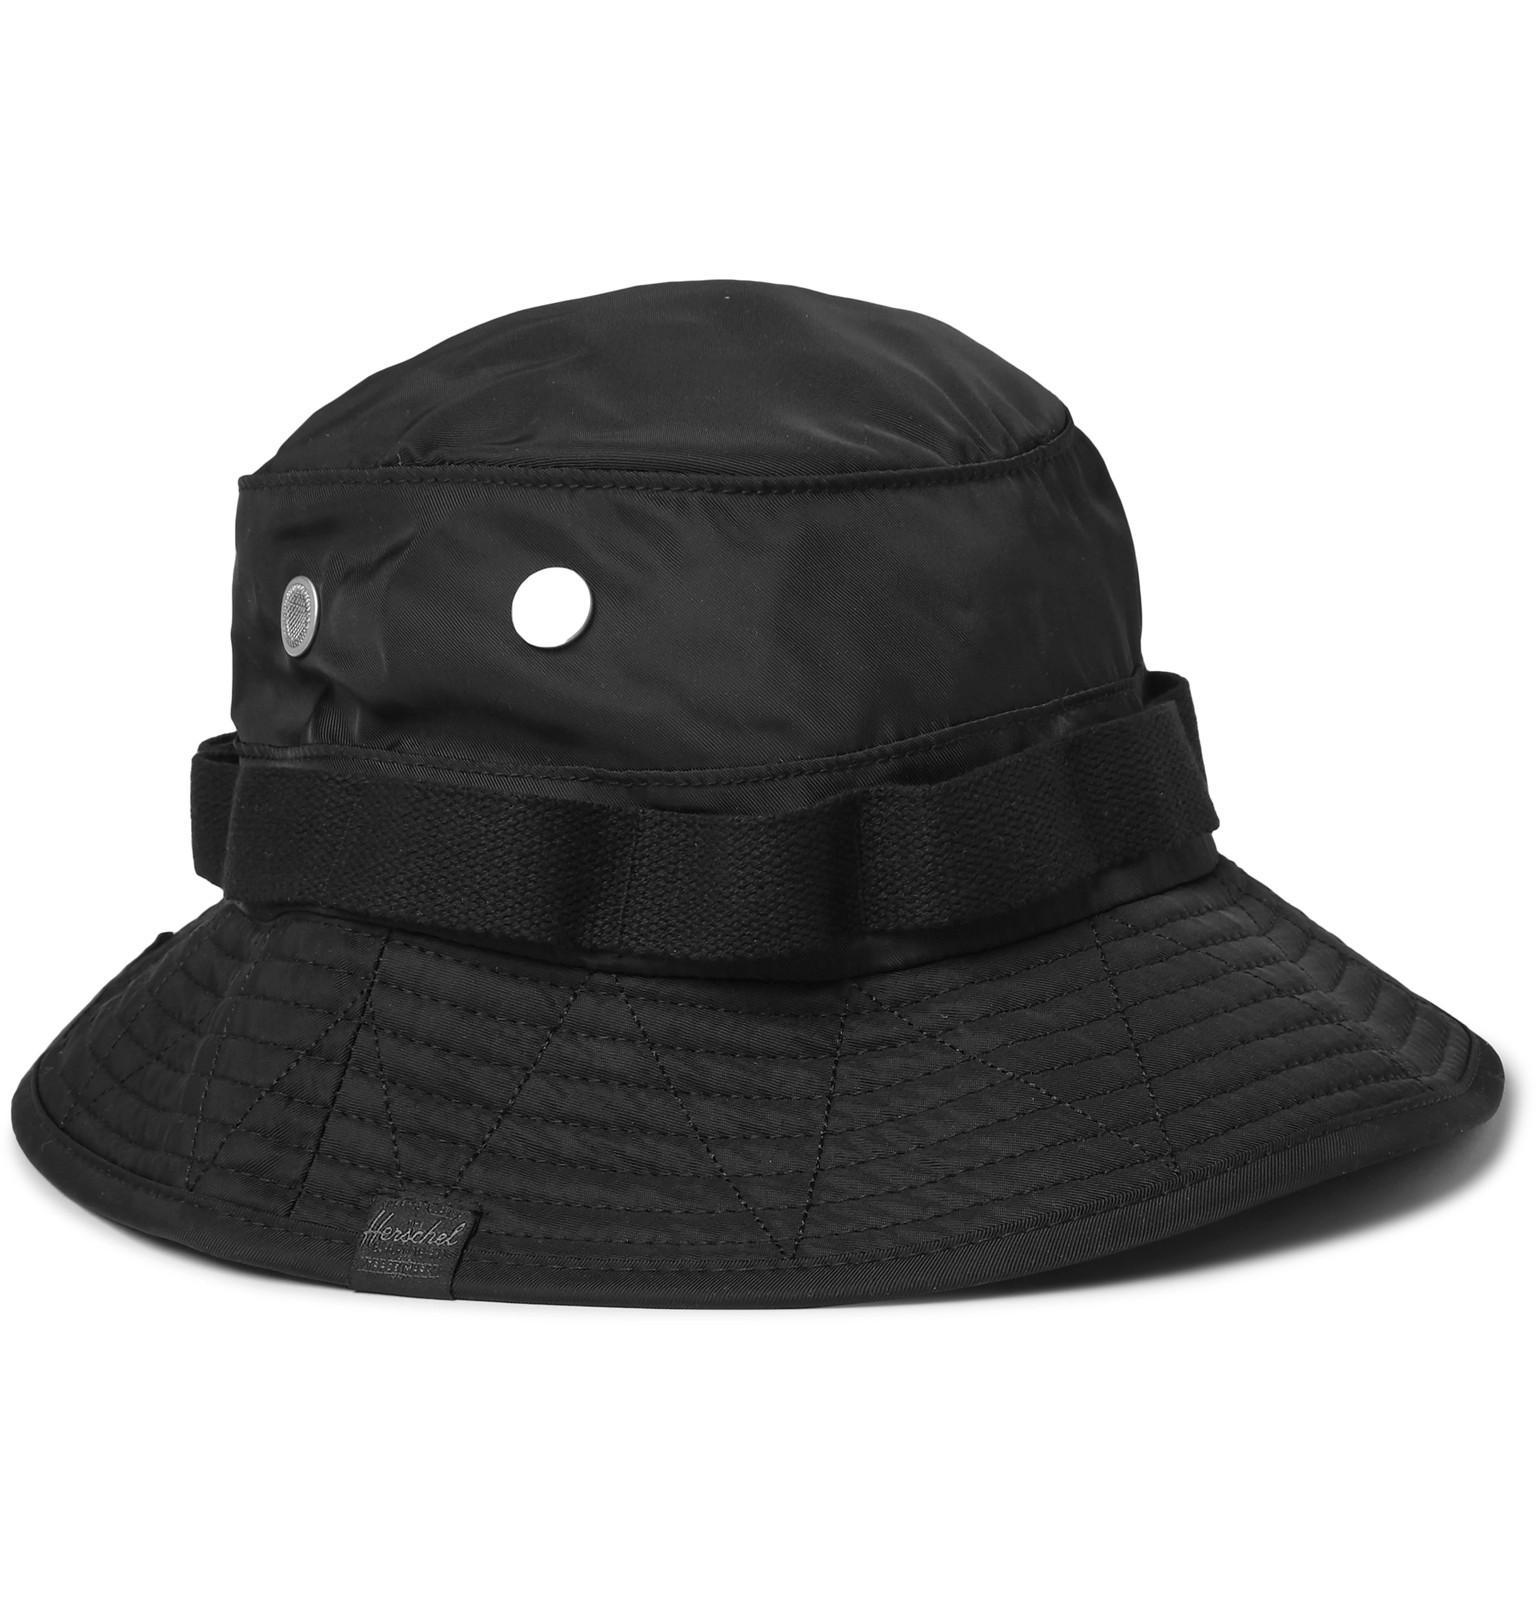 Lyst - Herschel Supply Co. Creek Shell Bucket Hat in Black for Men 00c4abec82ad